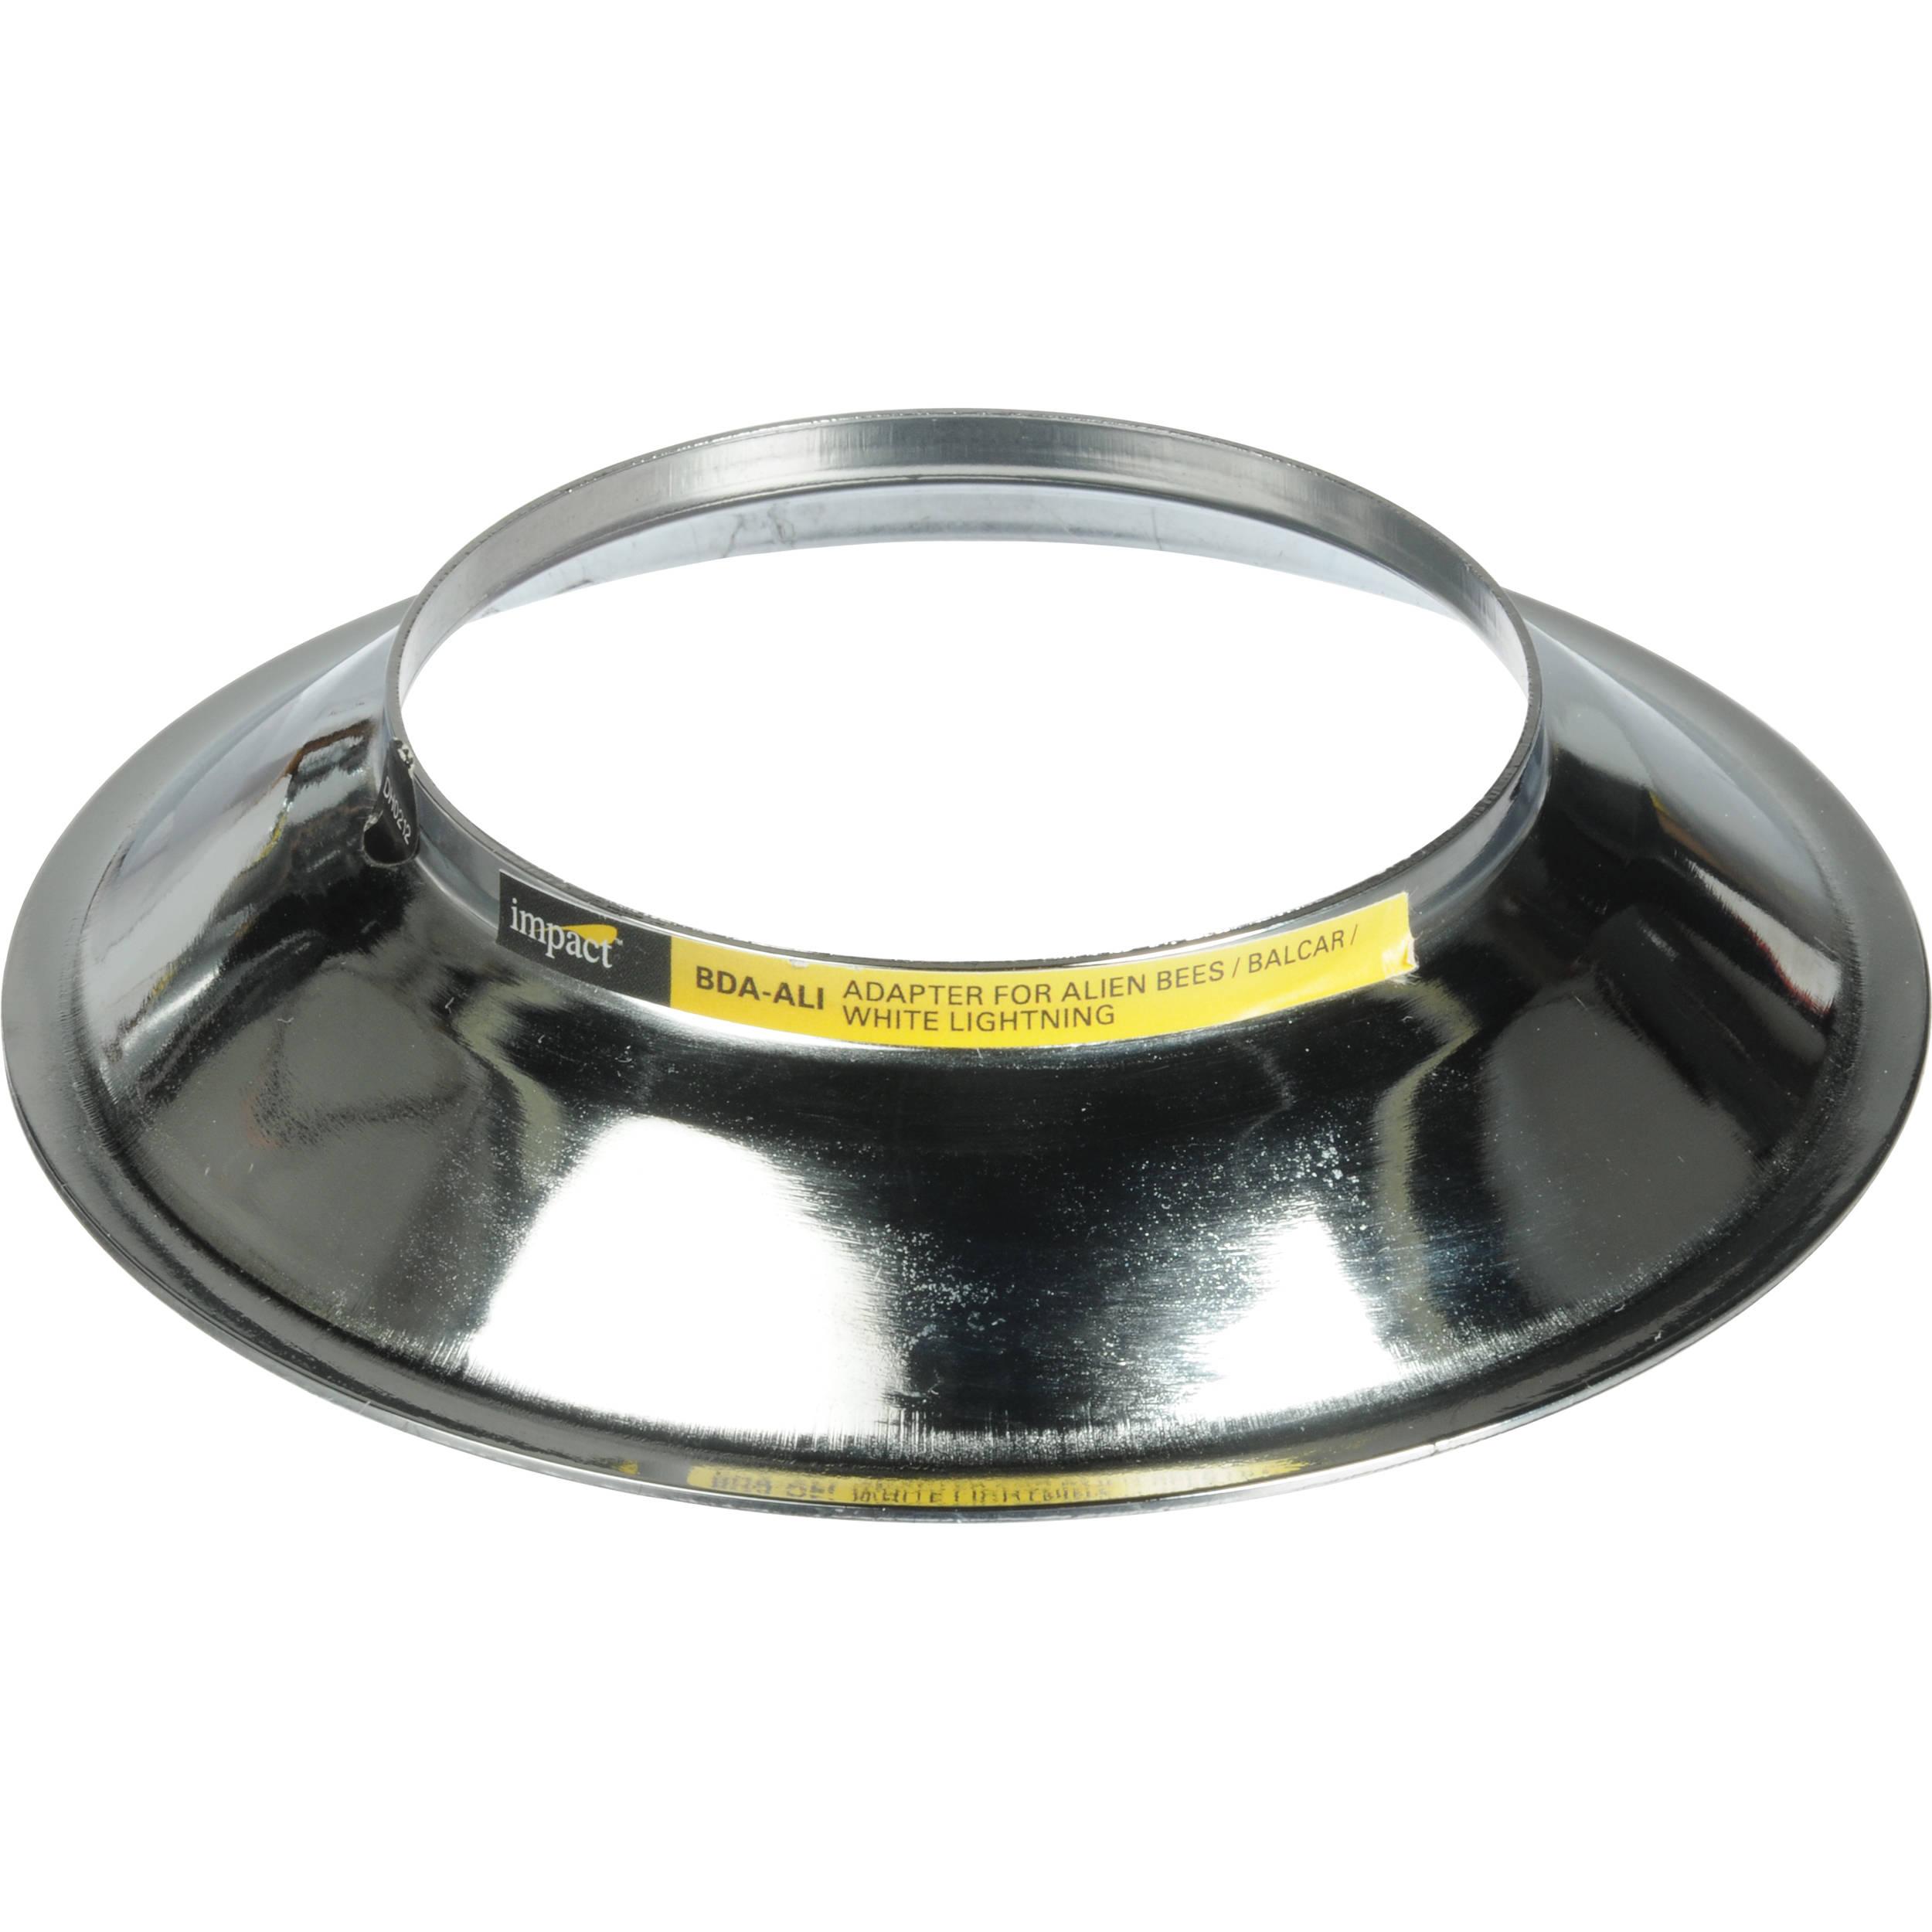 Elinchrom Rotalux Alien Bees Balcar Adapter: Impact Beauty Dish Adapter For Paul C. Buff Alien Bee, BDA-ALI